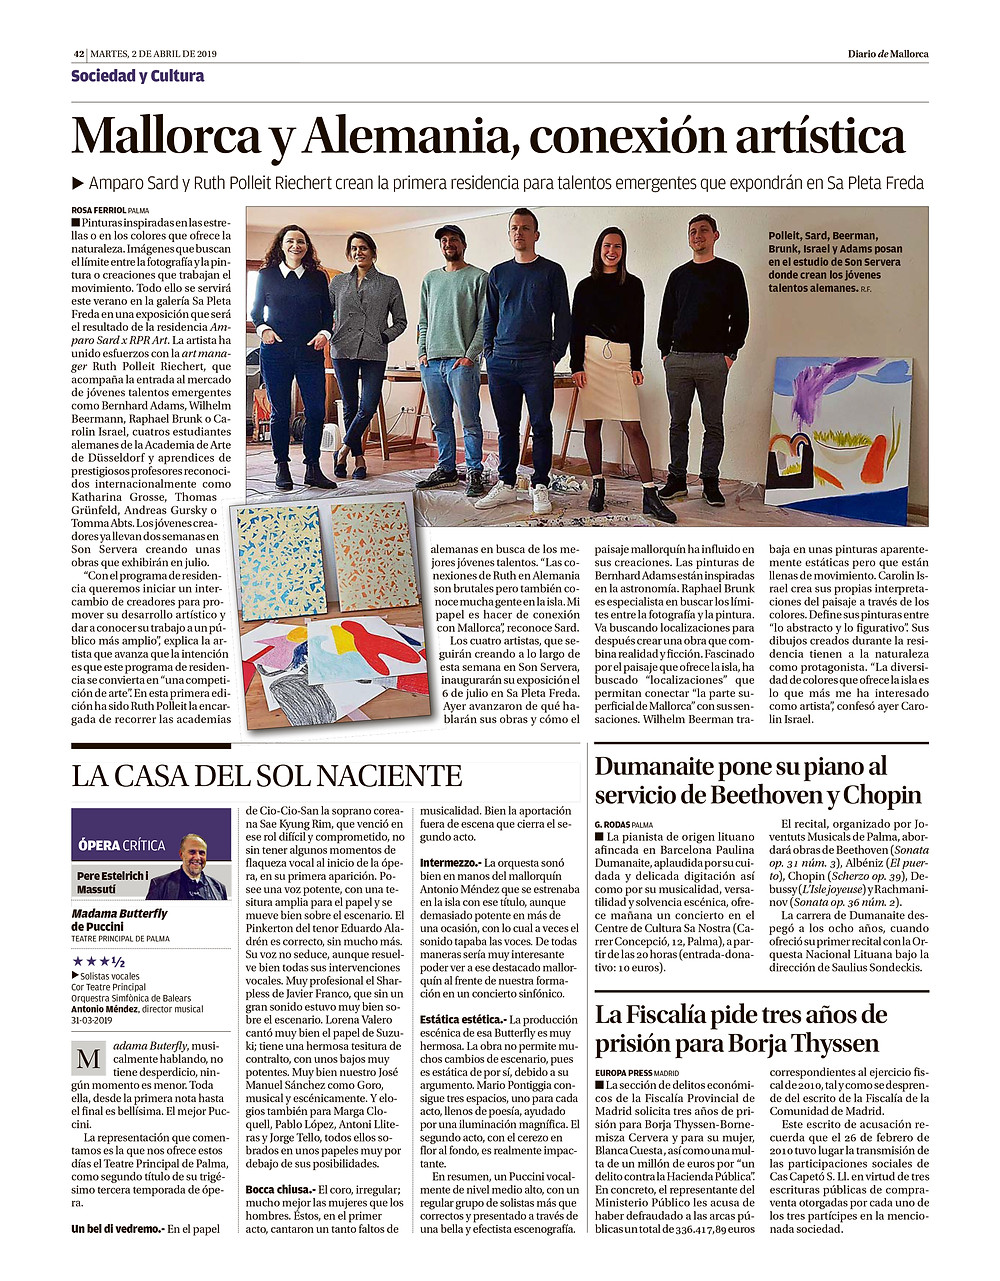 Presse Artikel in Diario de Mallorca